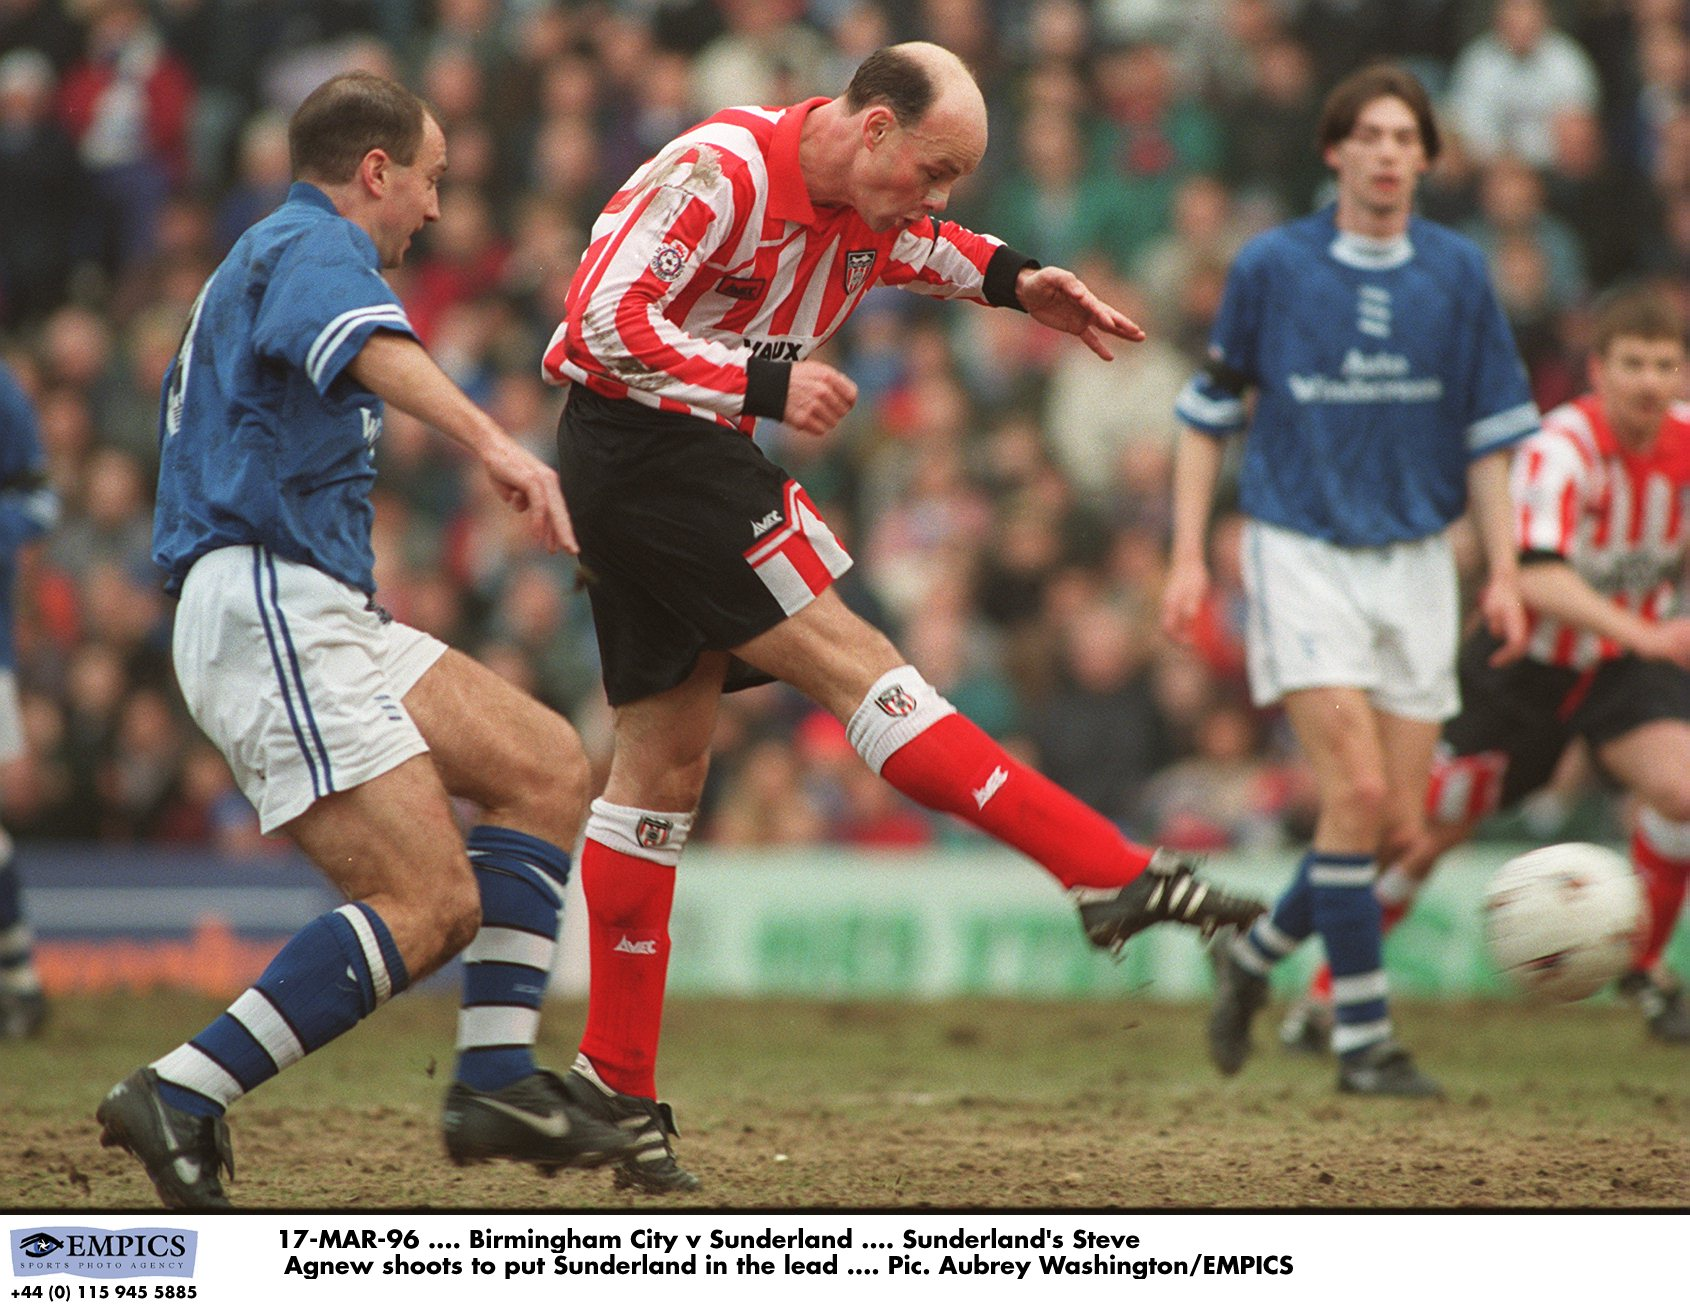 Birmingham City v Sunderland - Endsleigh League Division One - Soccer